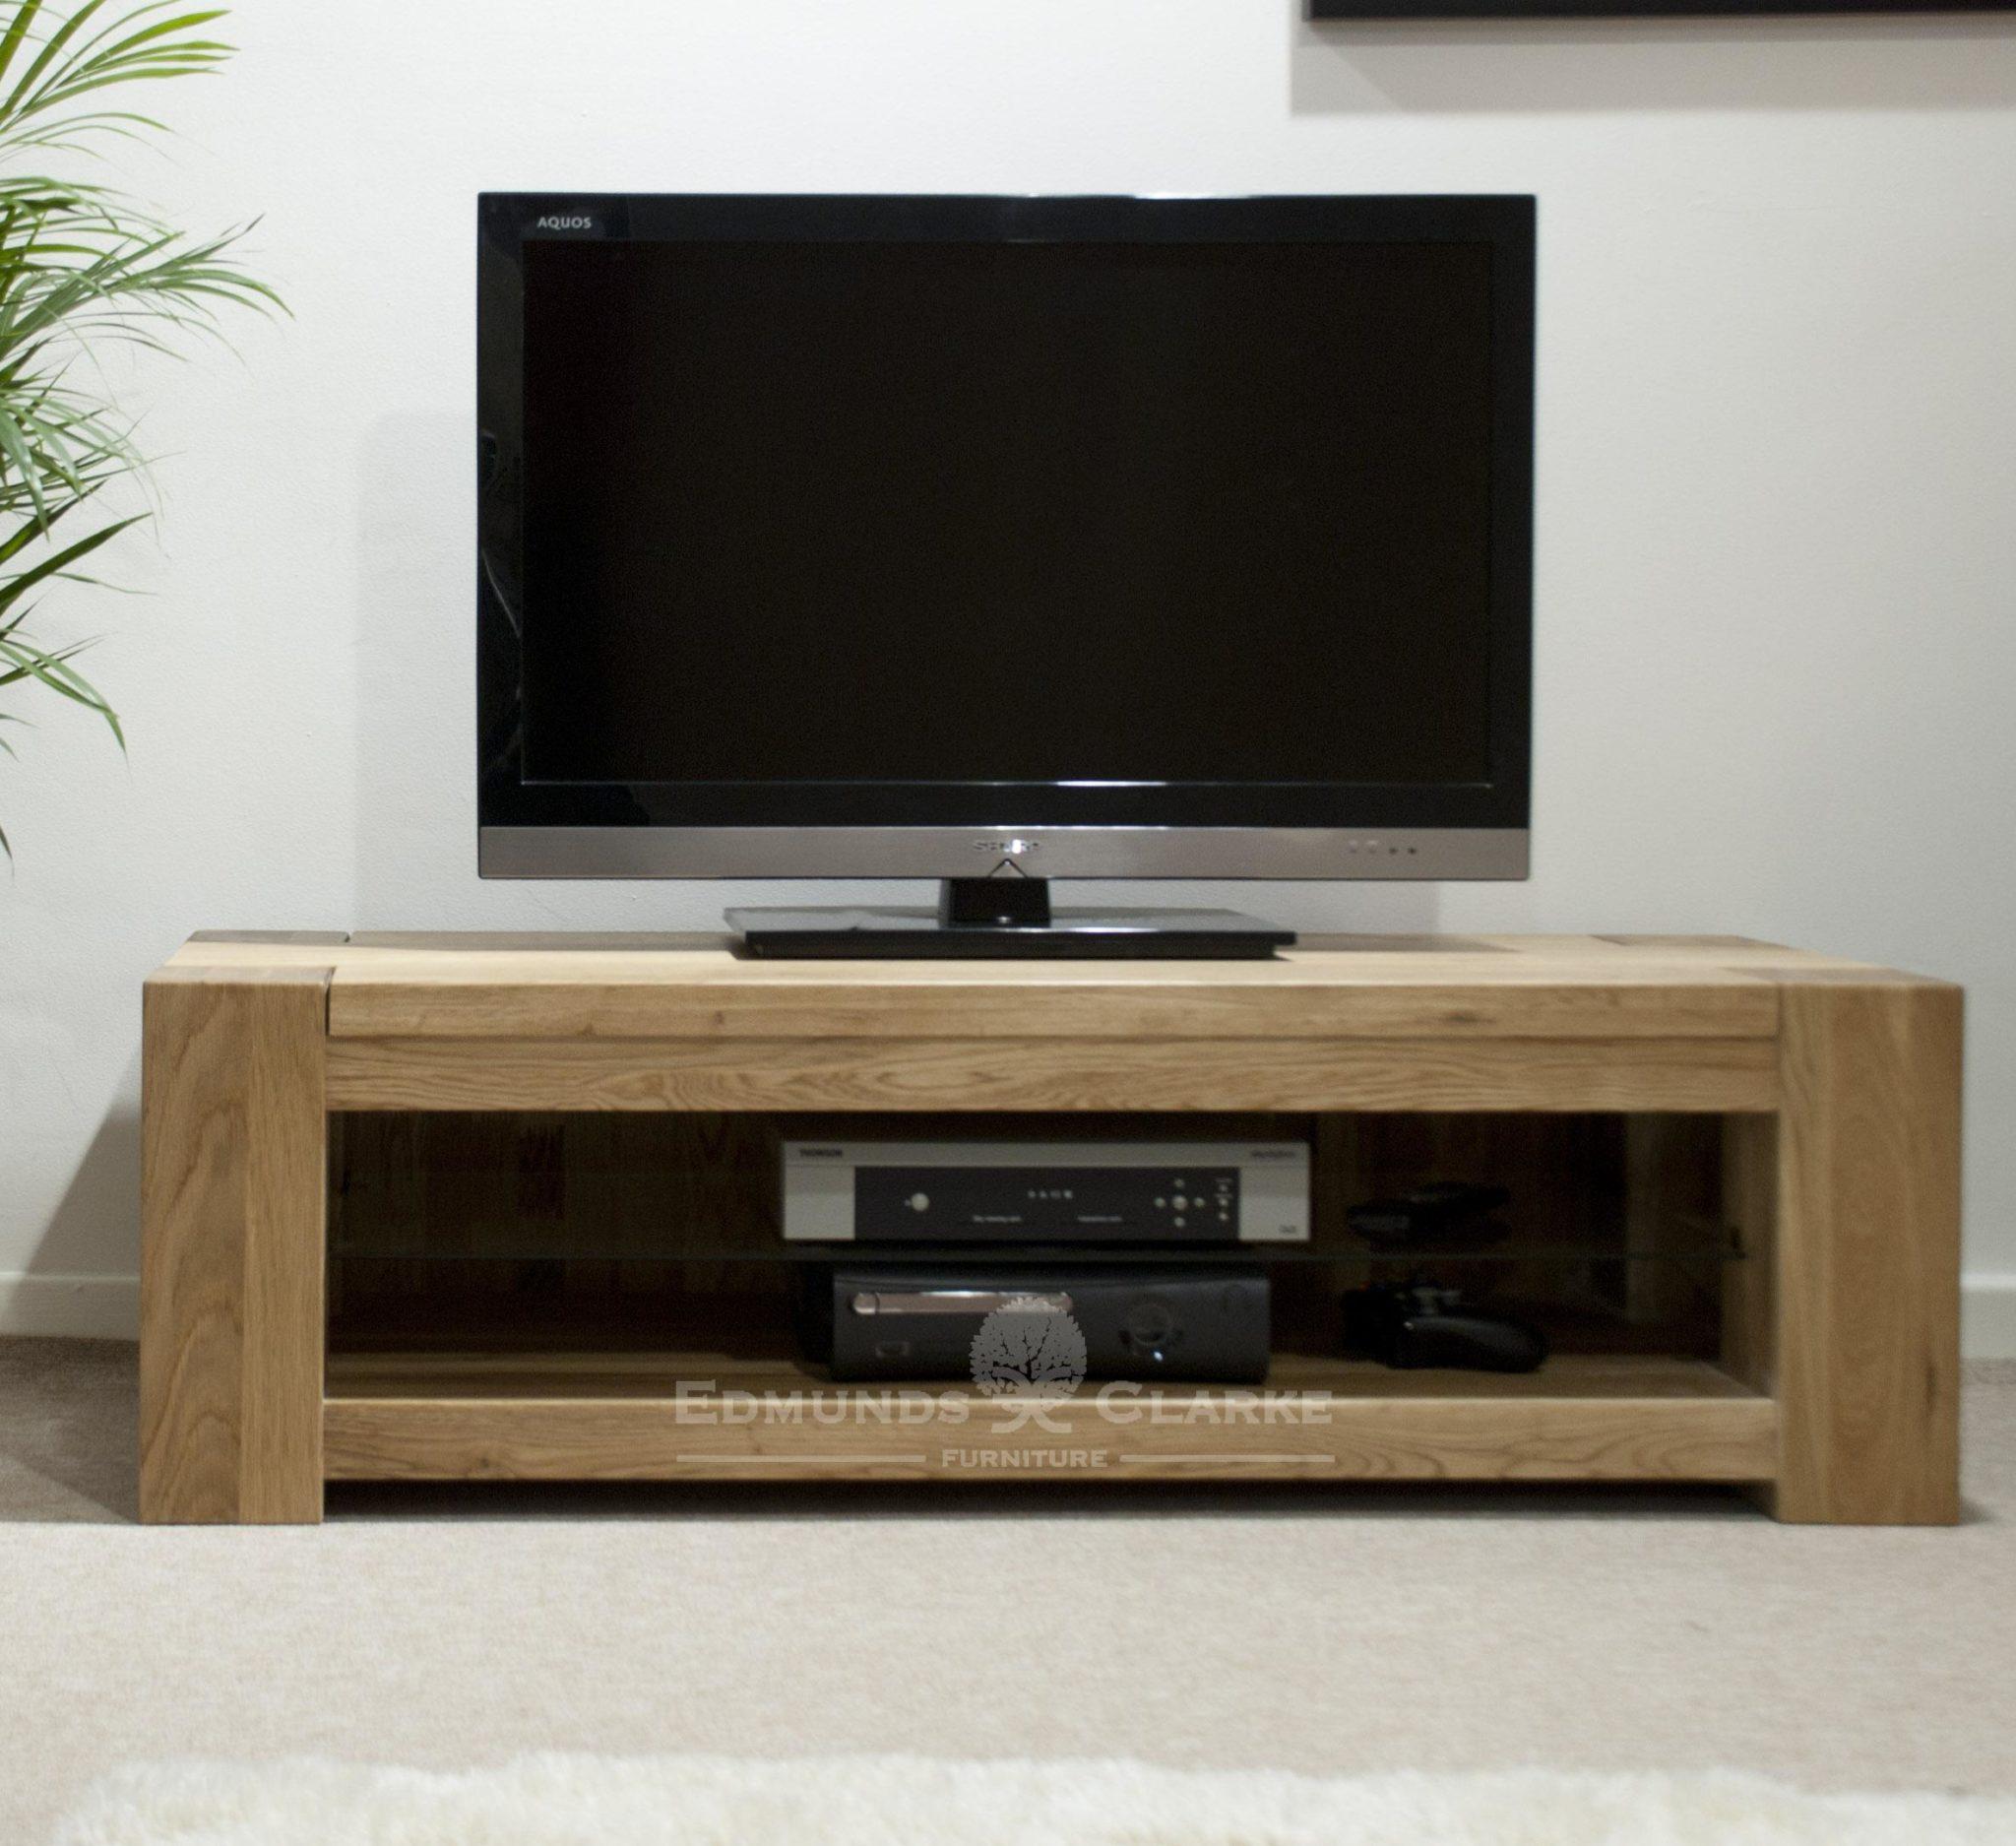 Newmarket chunky solid oak wide plasma television unit one adjustable glass shelf